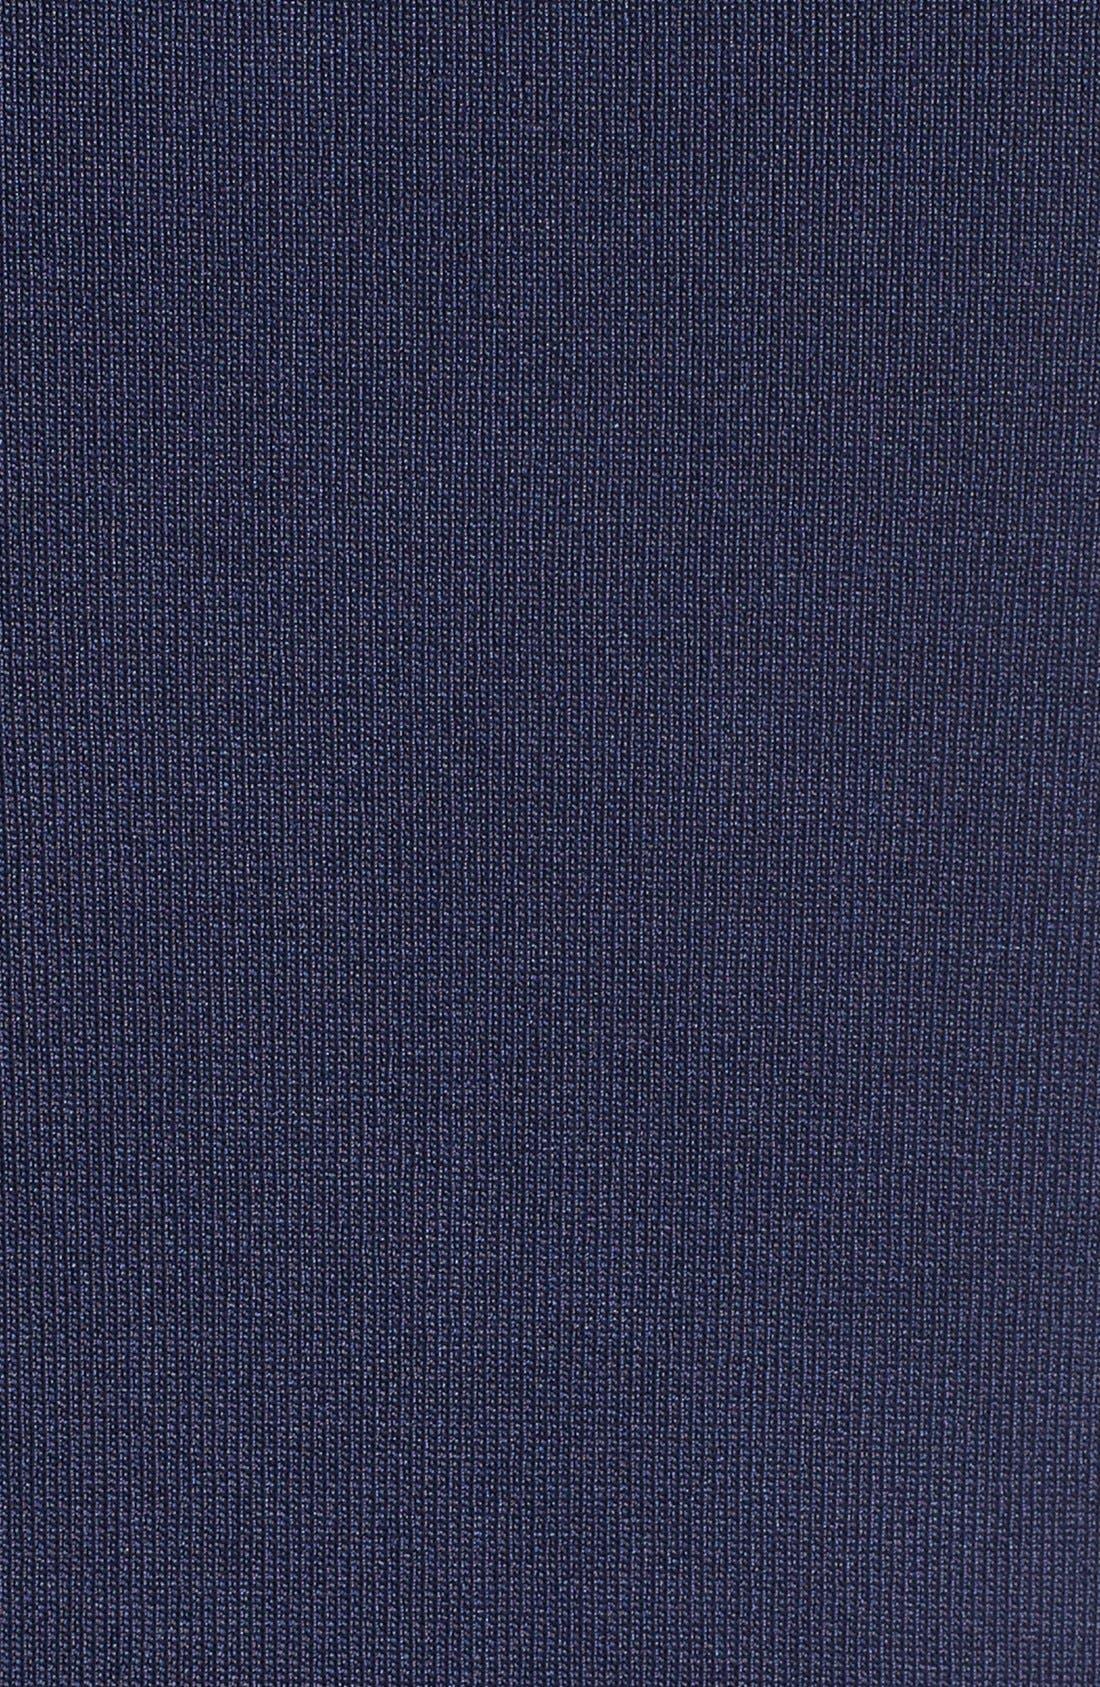 Sleeveless Mock Neck Knit Dress,                             Alternate thumbnail 10, color,                             410